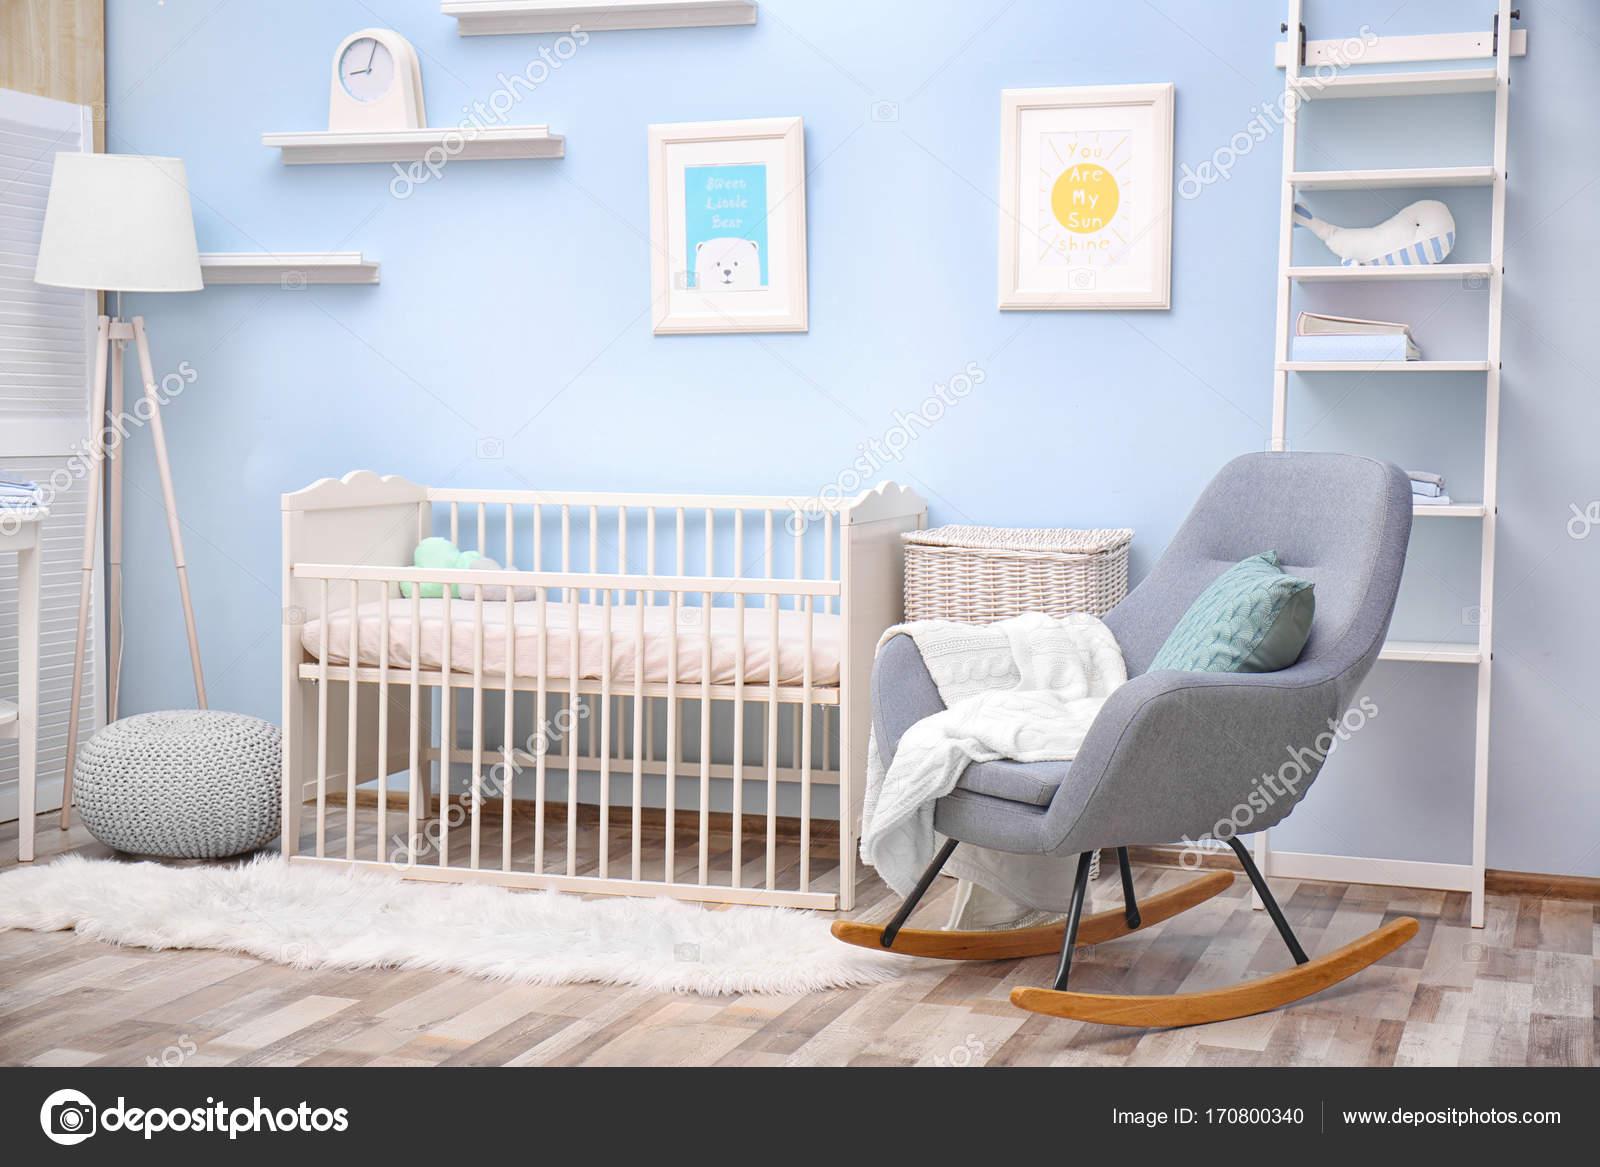 Baby Schlafzimmer design — Stockfoto © belchonock #170800340